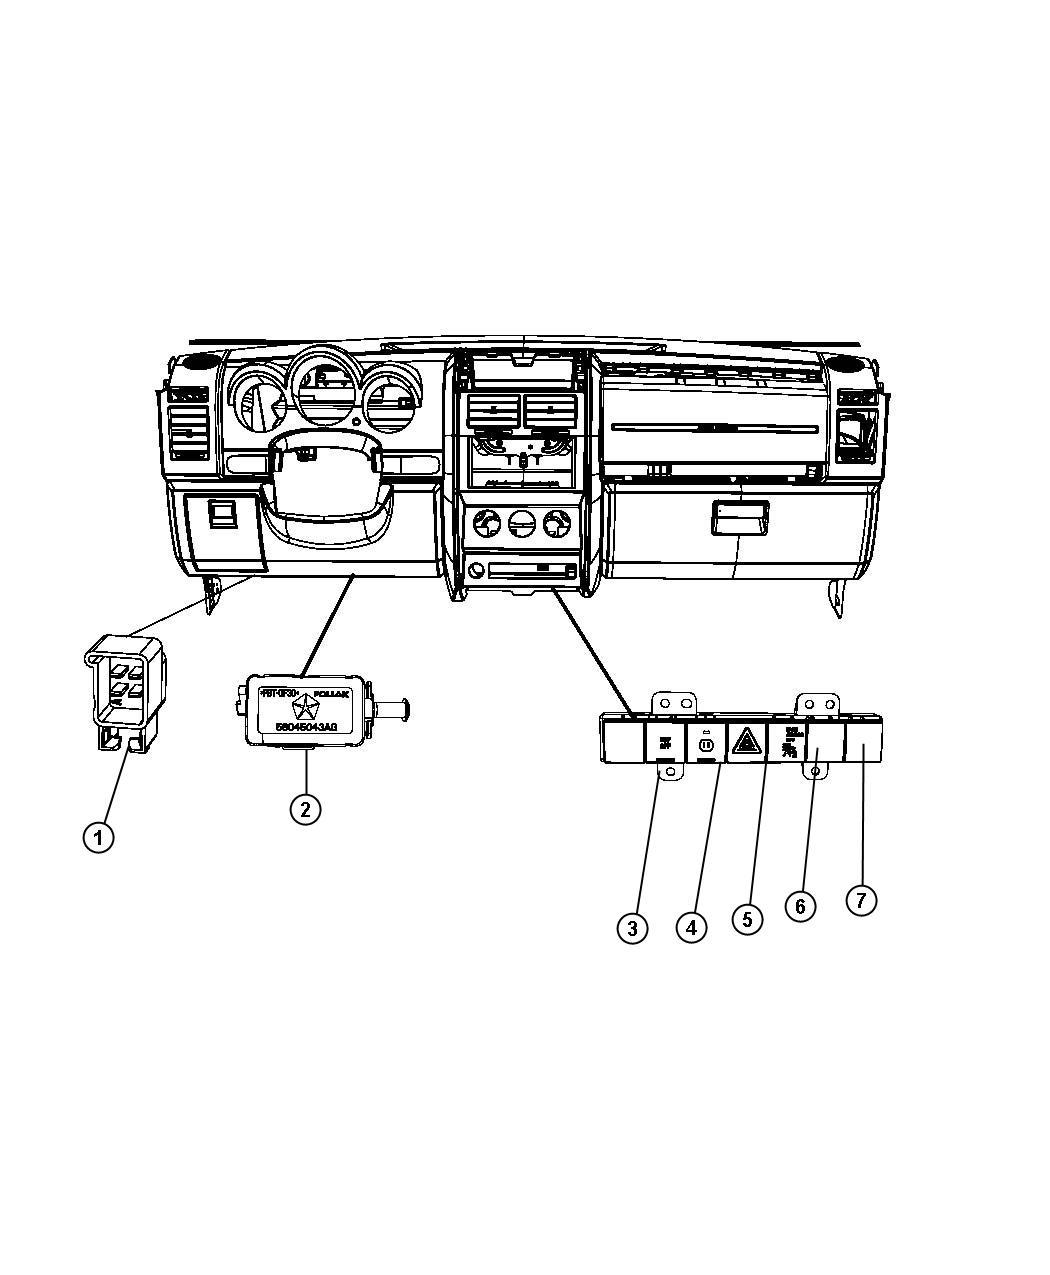 2009 Dodge Nitro Slt 4 0l V6 A  T 4x4 Switch  5 Gang  Export  Programheadlamp  Systemhill